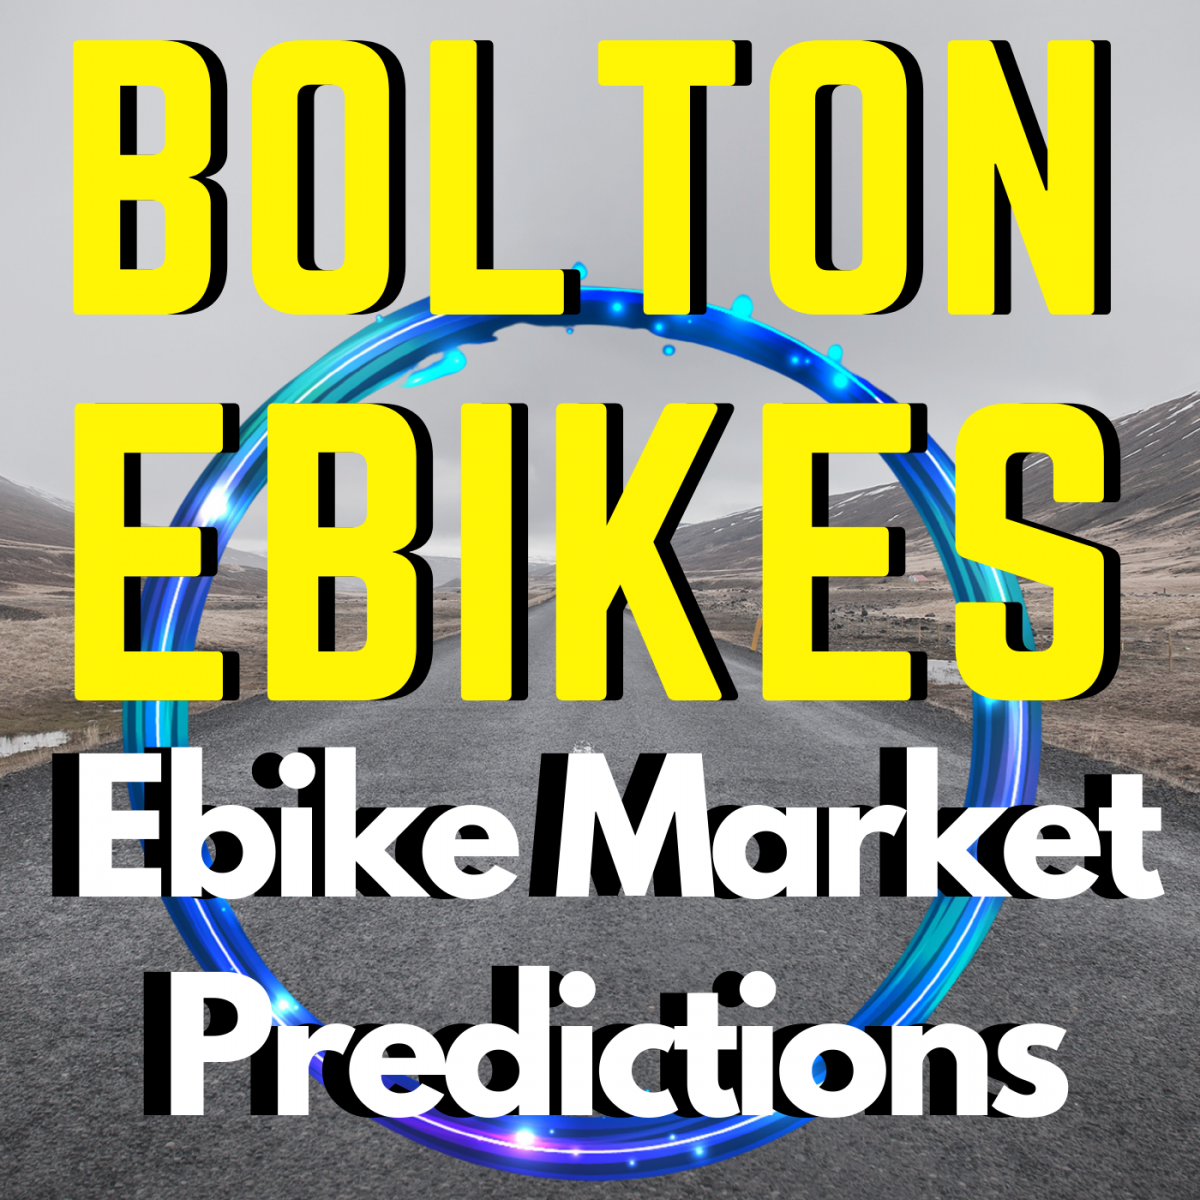 Ebike Market Predictions